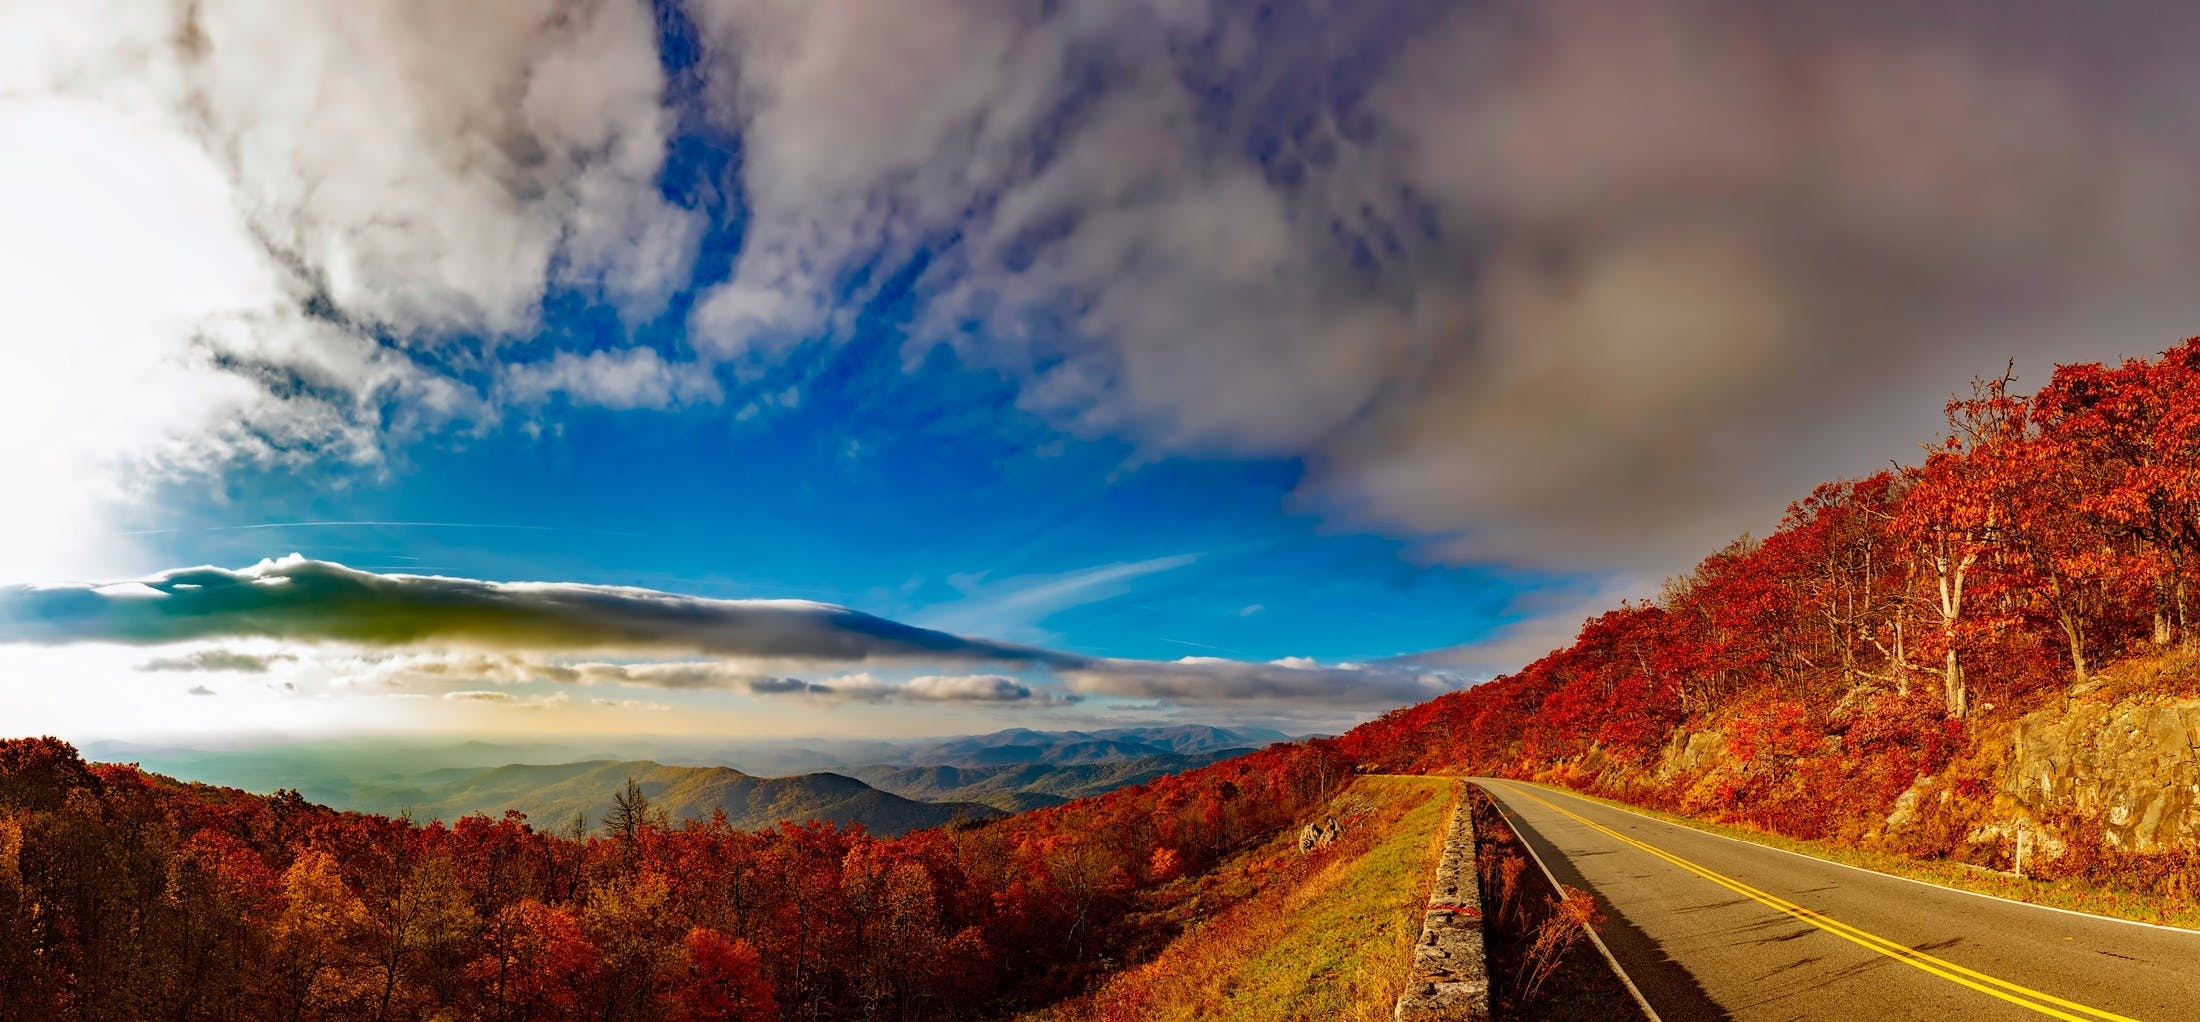 Kostenloses Stock Foto zu licht, dämmerung, landschaft, sonnenuntergang